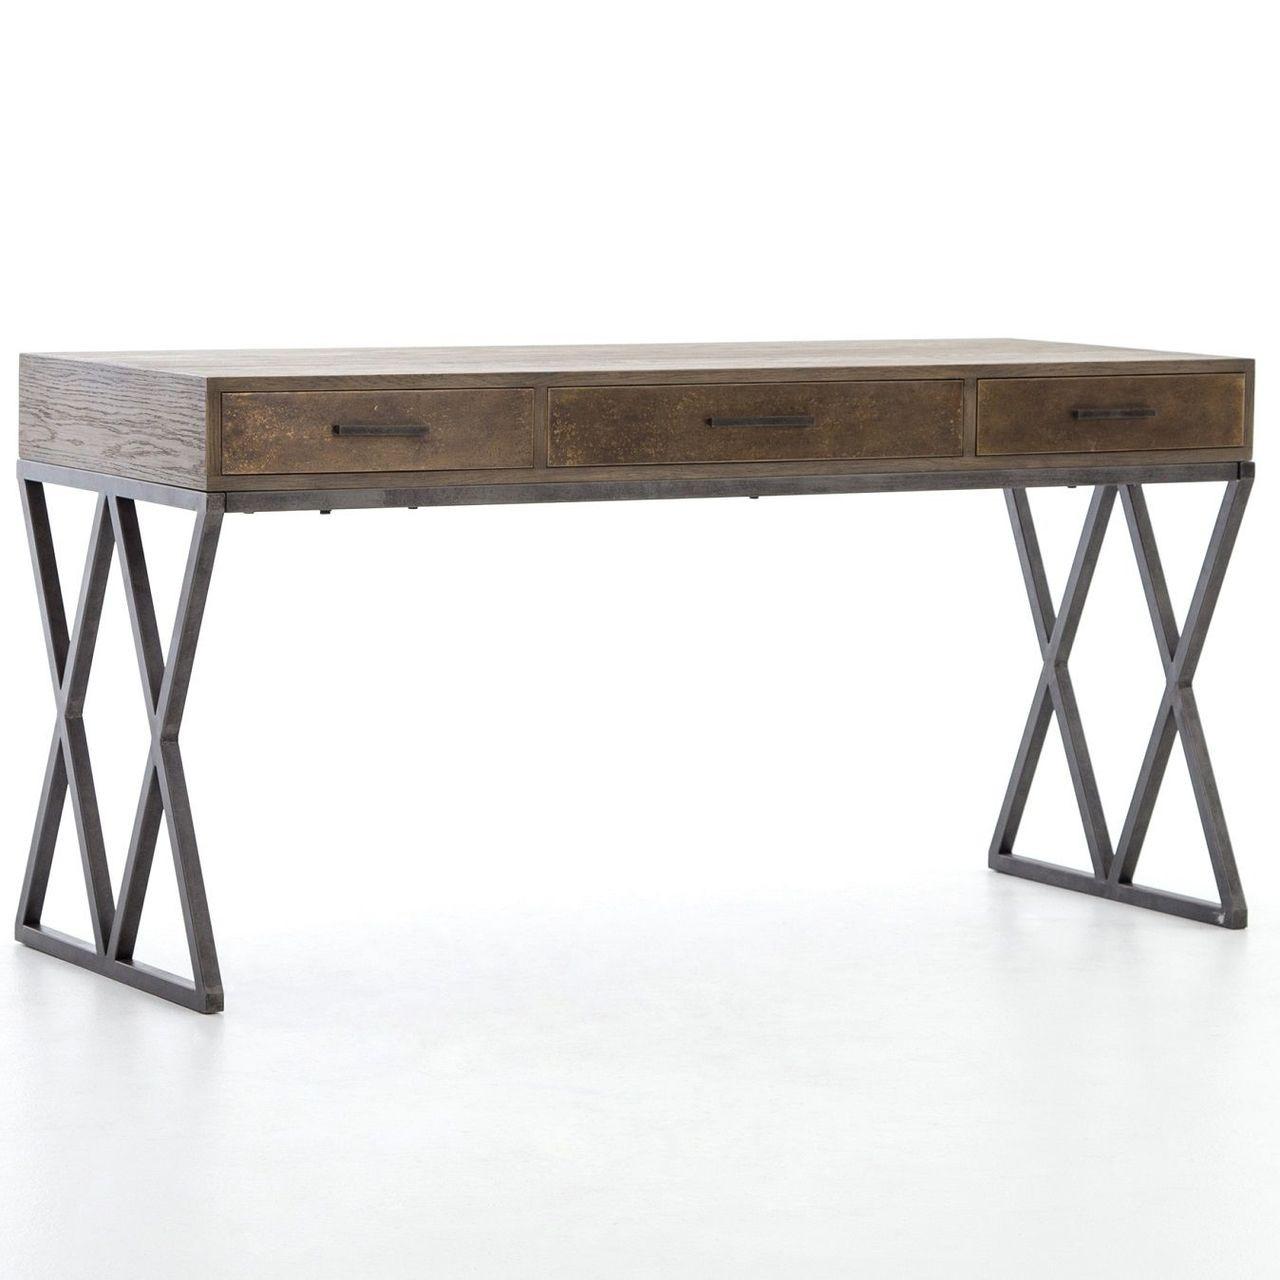 Astonishing Sampson Modern Industrial Oak Wood Desk 59 Download Free Architecture Designs Embacsunscenecom